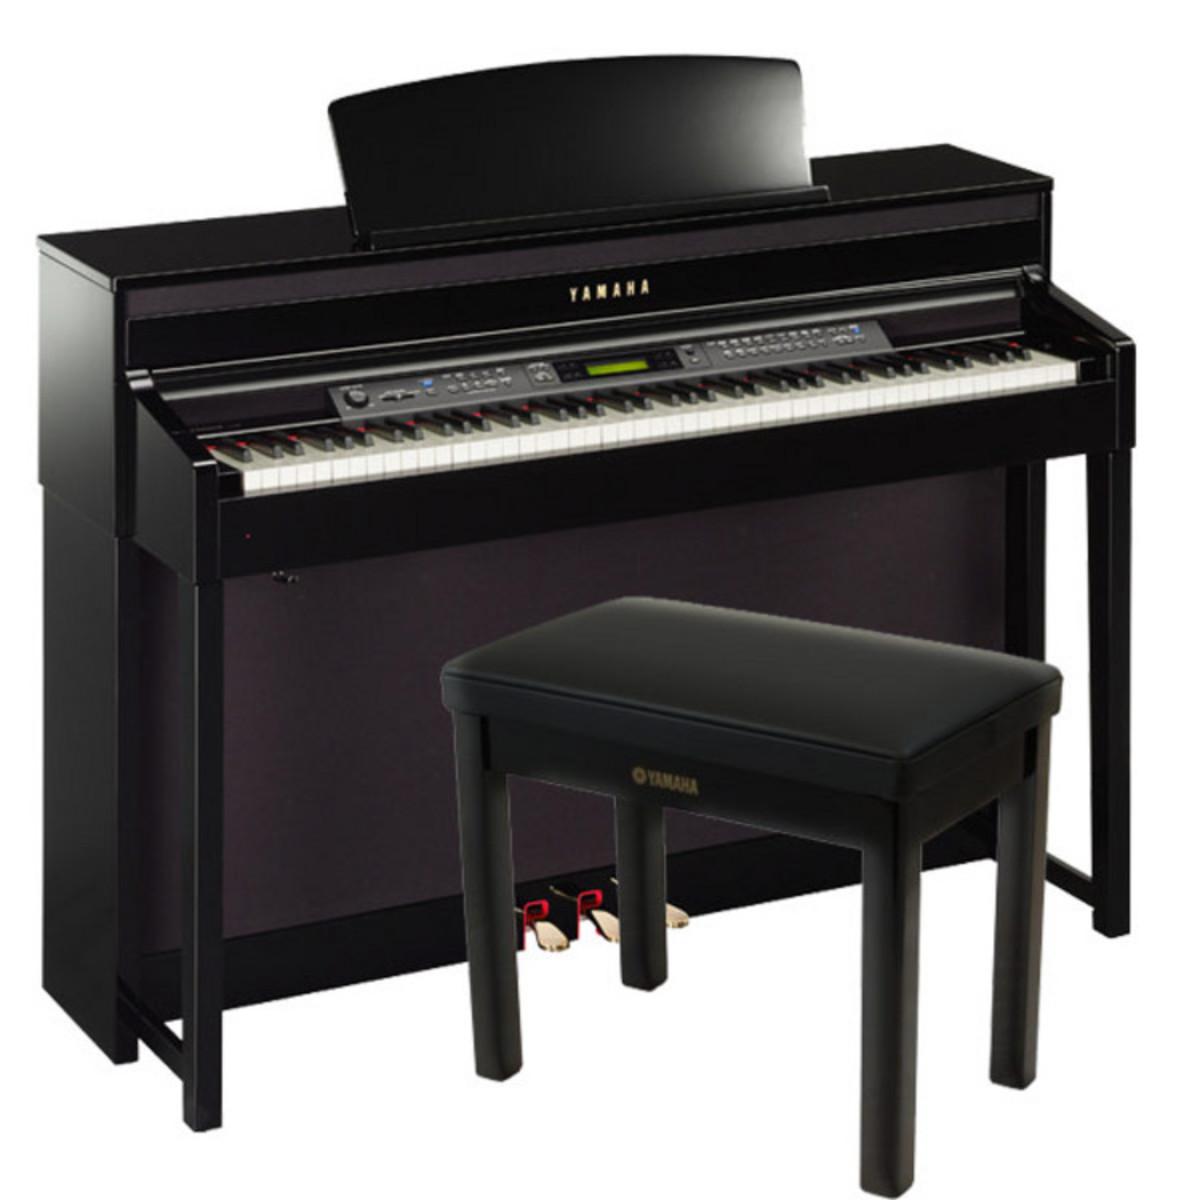 Disque yamaha clavinova clp480 b ne poli comprend banc for Yamaha clavinova cvp 303